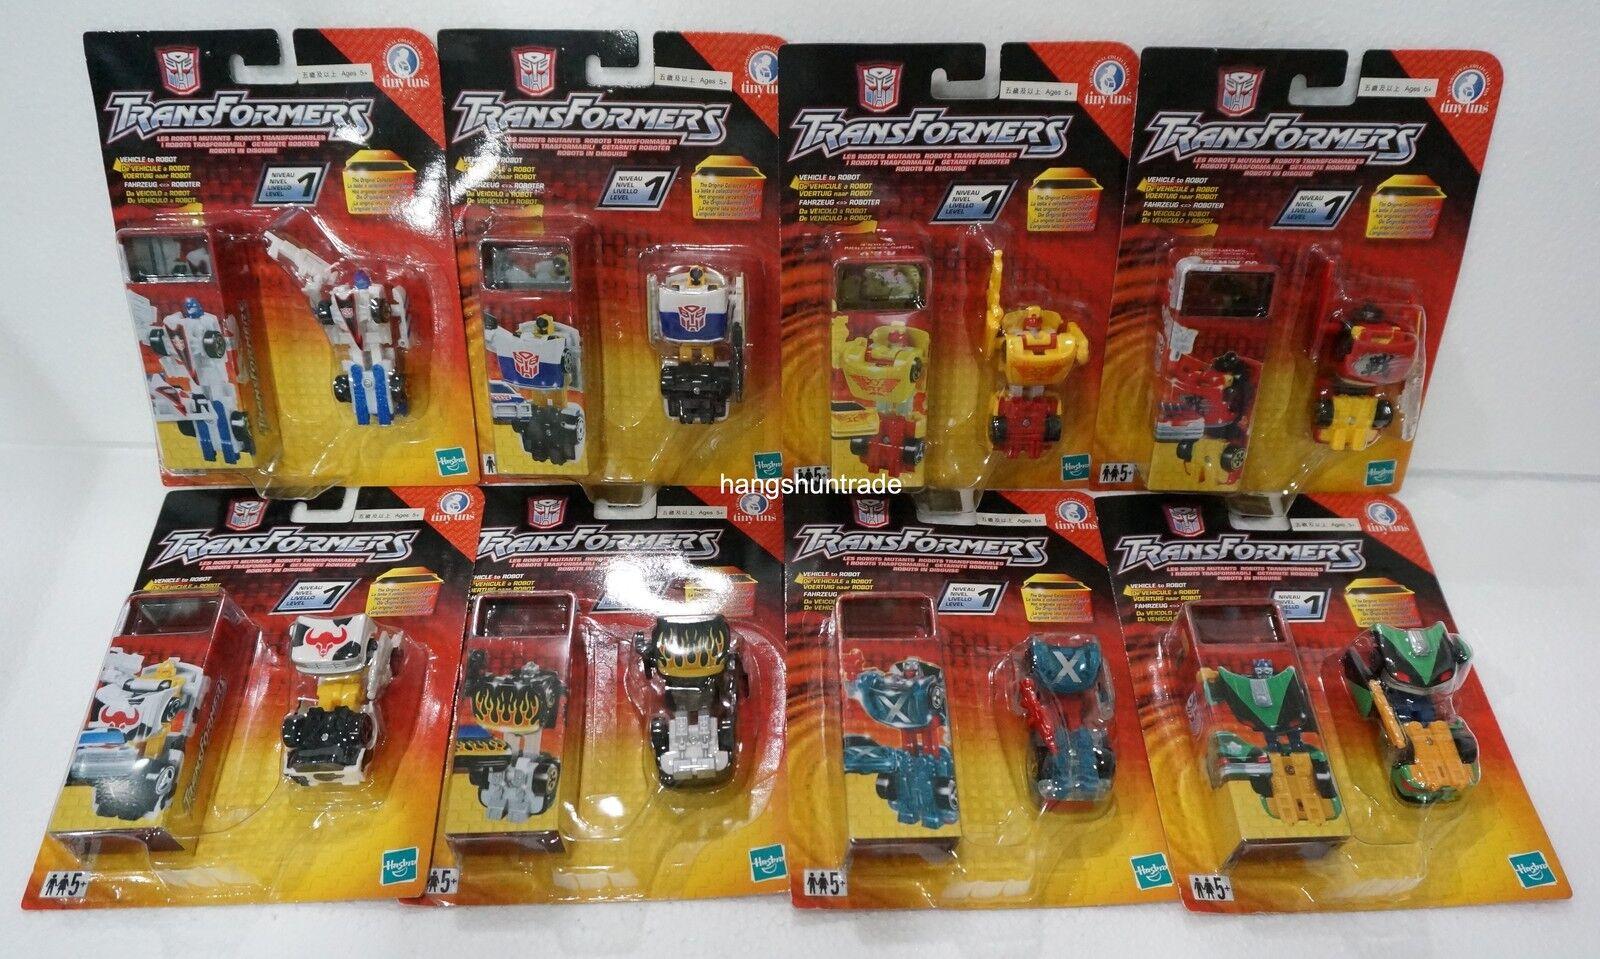 Hasbro Transformers pequeño latas transversal Sideswipe Mirage Ironhide Hot Shot 8 piezas